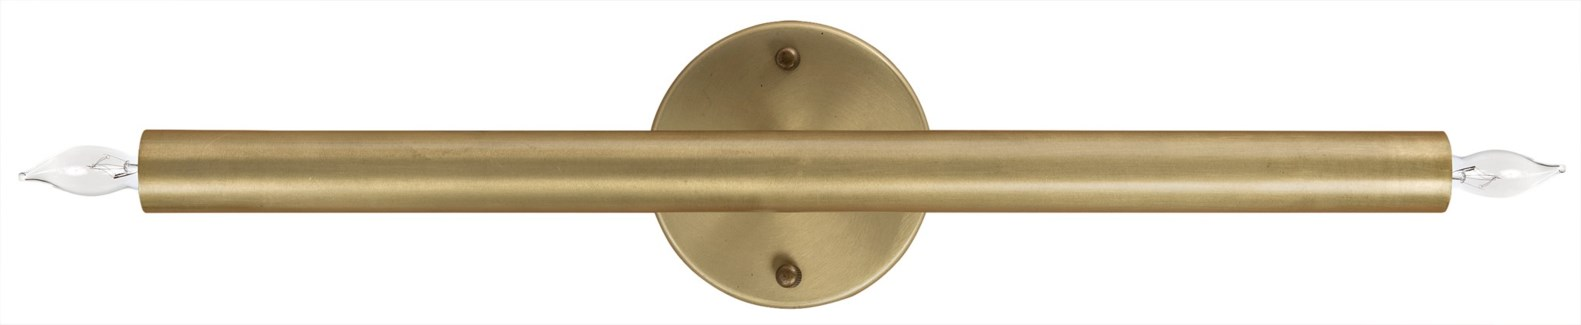 Straight Sconce, Antique Brass